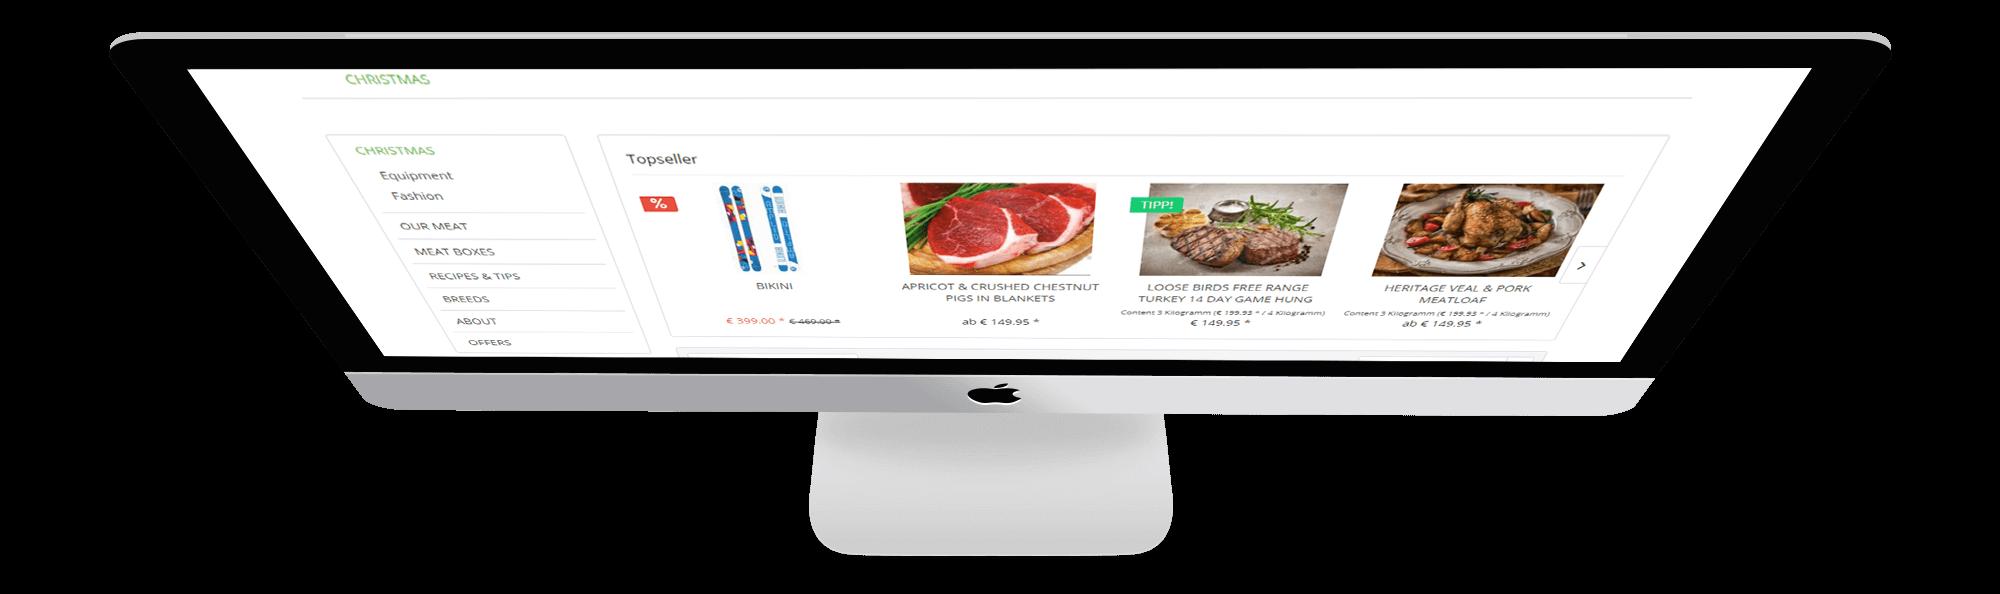 DABANG-BrandCrock-portfolio-Topseller-ipad